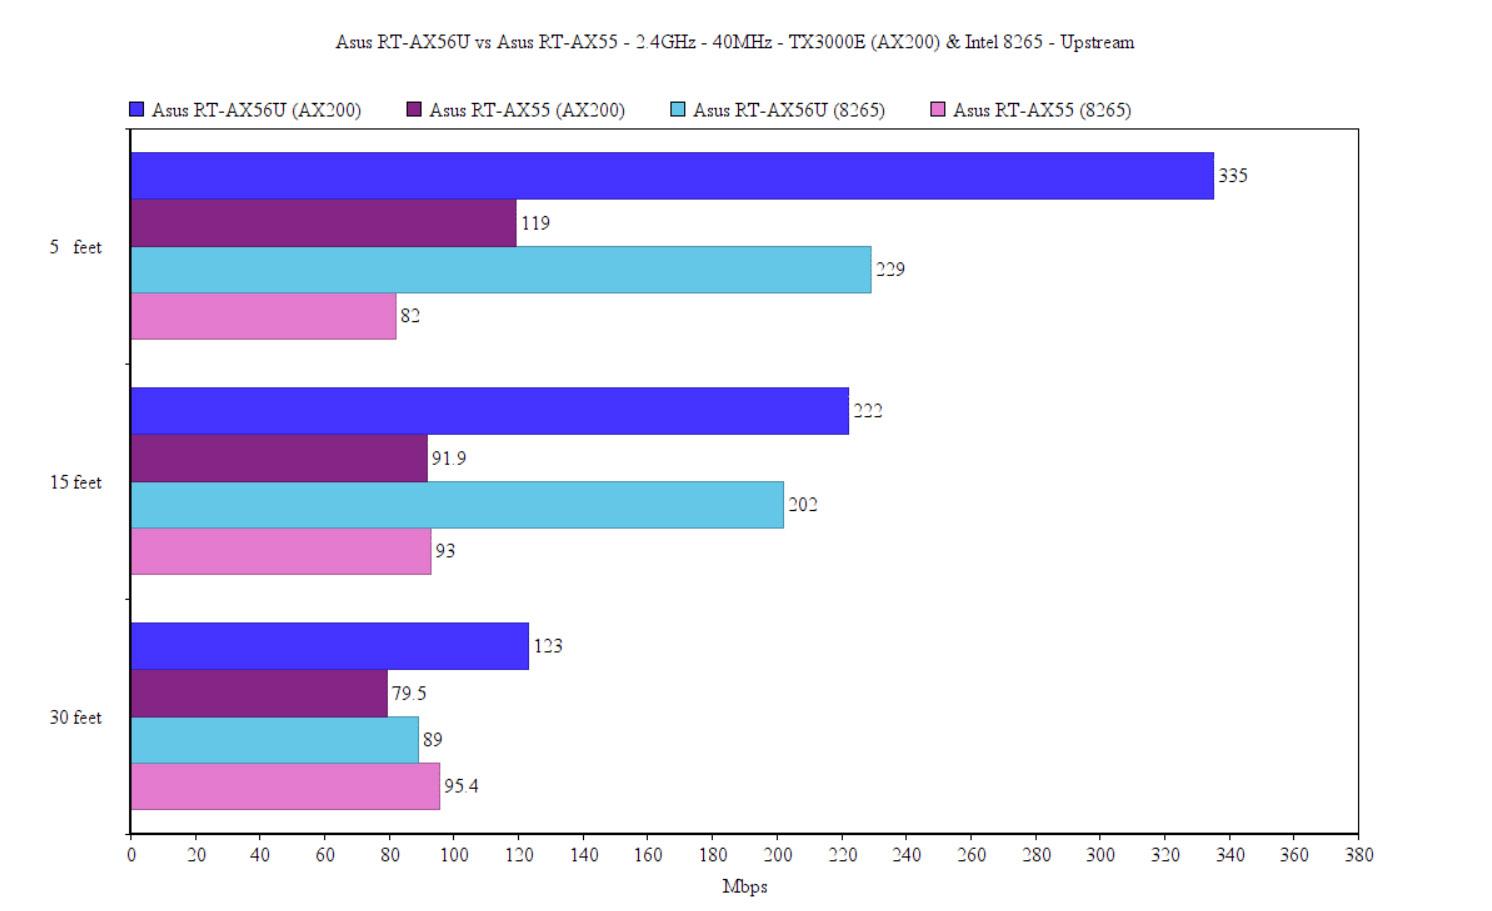 asus-rt-ax56u-vs-ax55-comparison